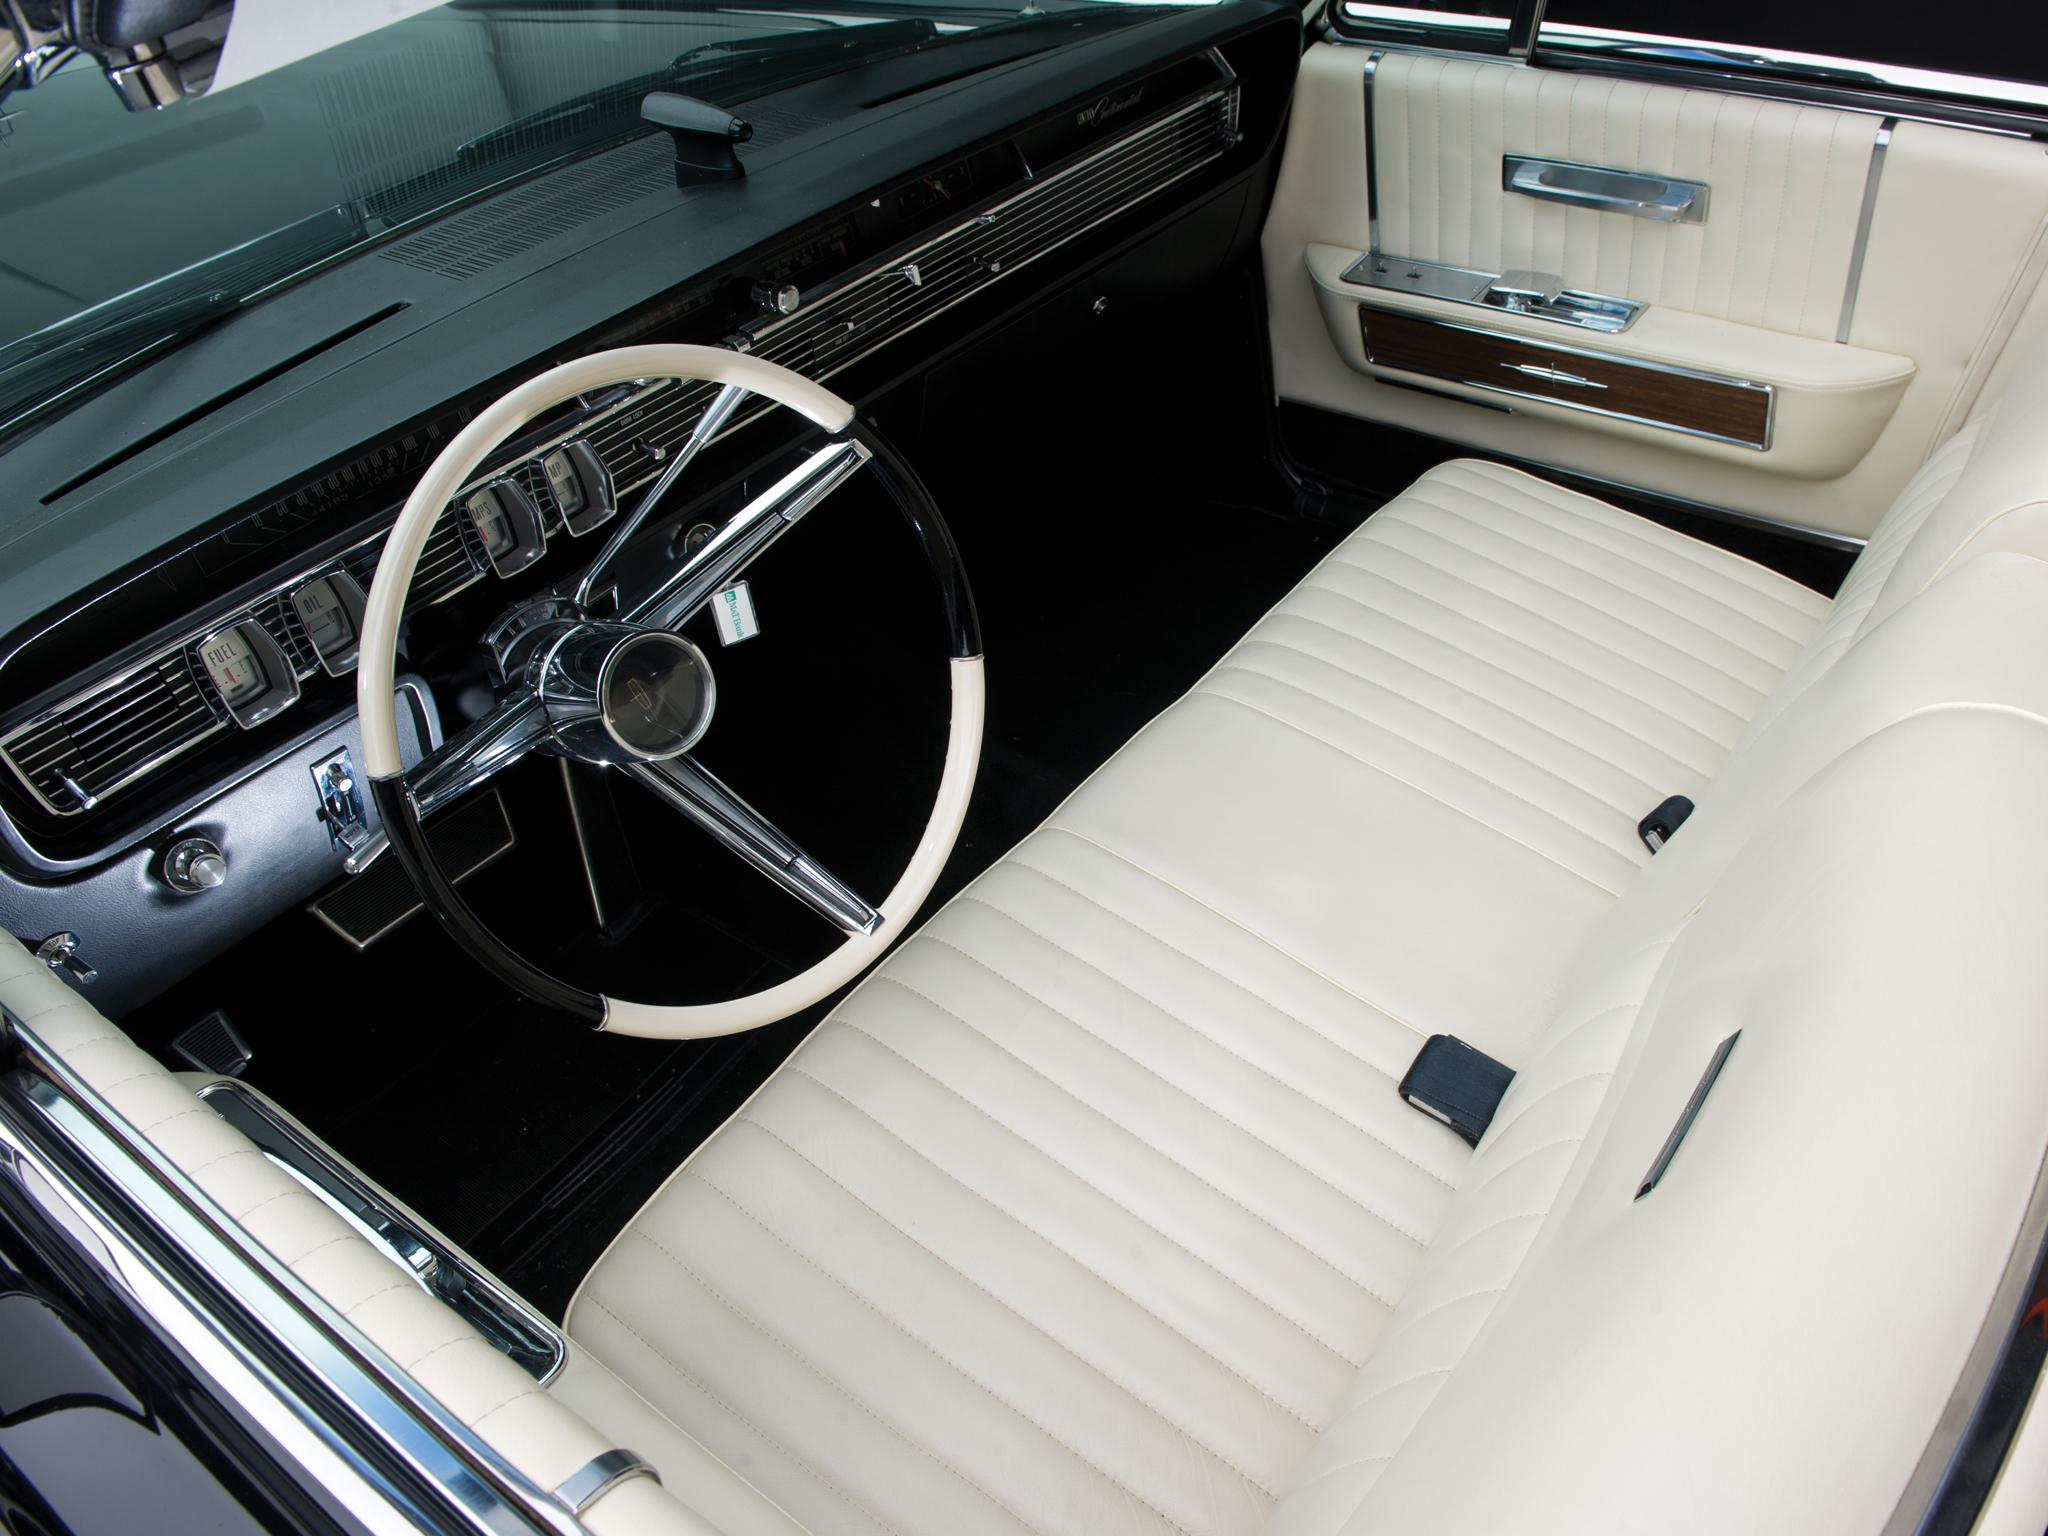 1965 lincoln continental convertible classic luxury interior t wallpaper 2048x1536 153955. Black Bedroom Furniture Sets. Home Design Ideas